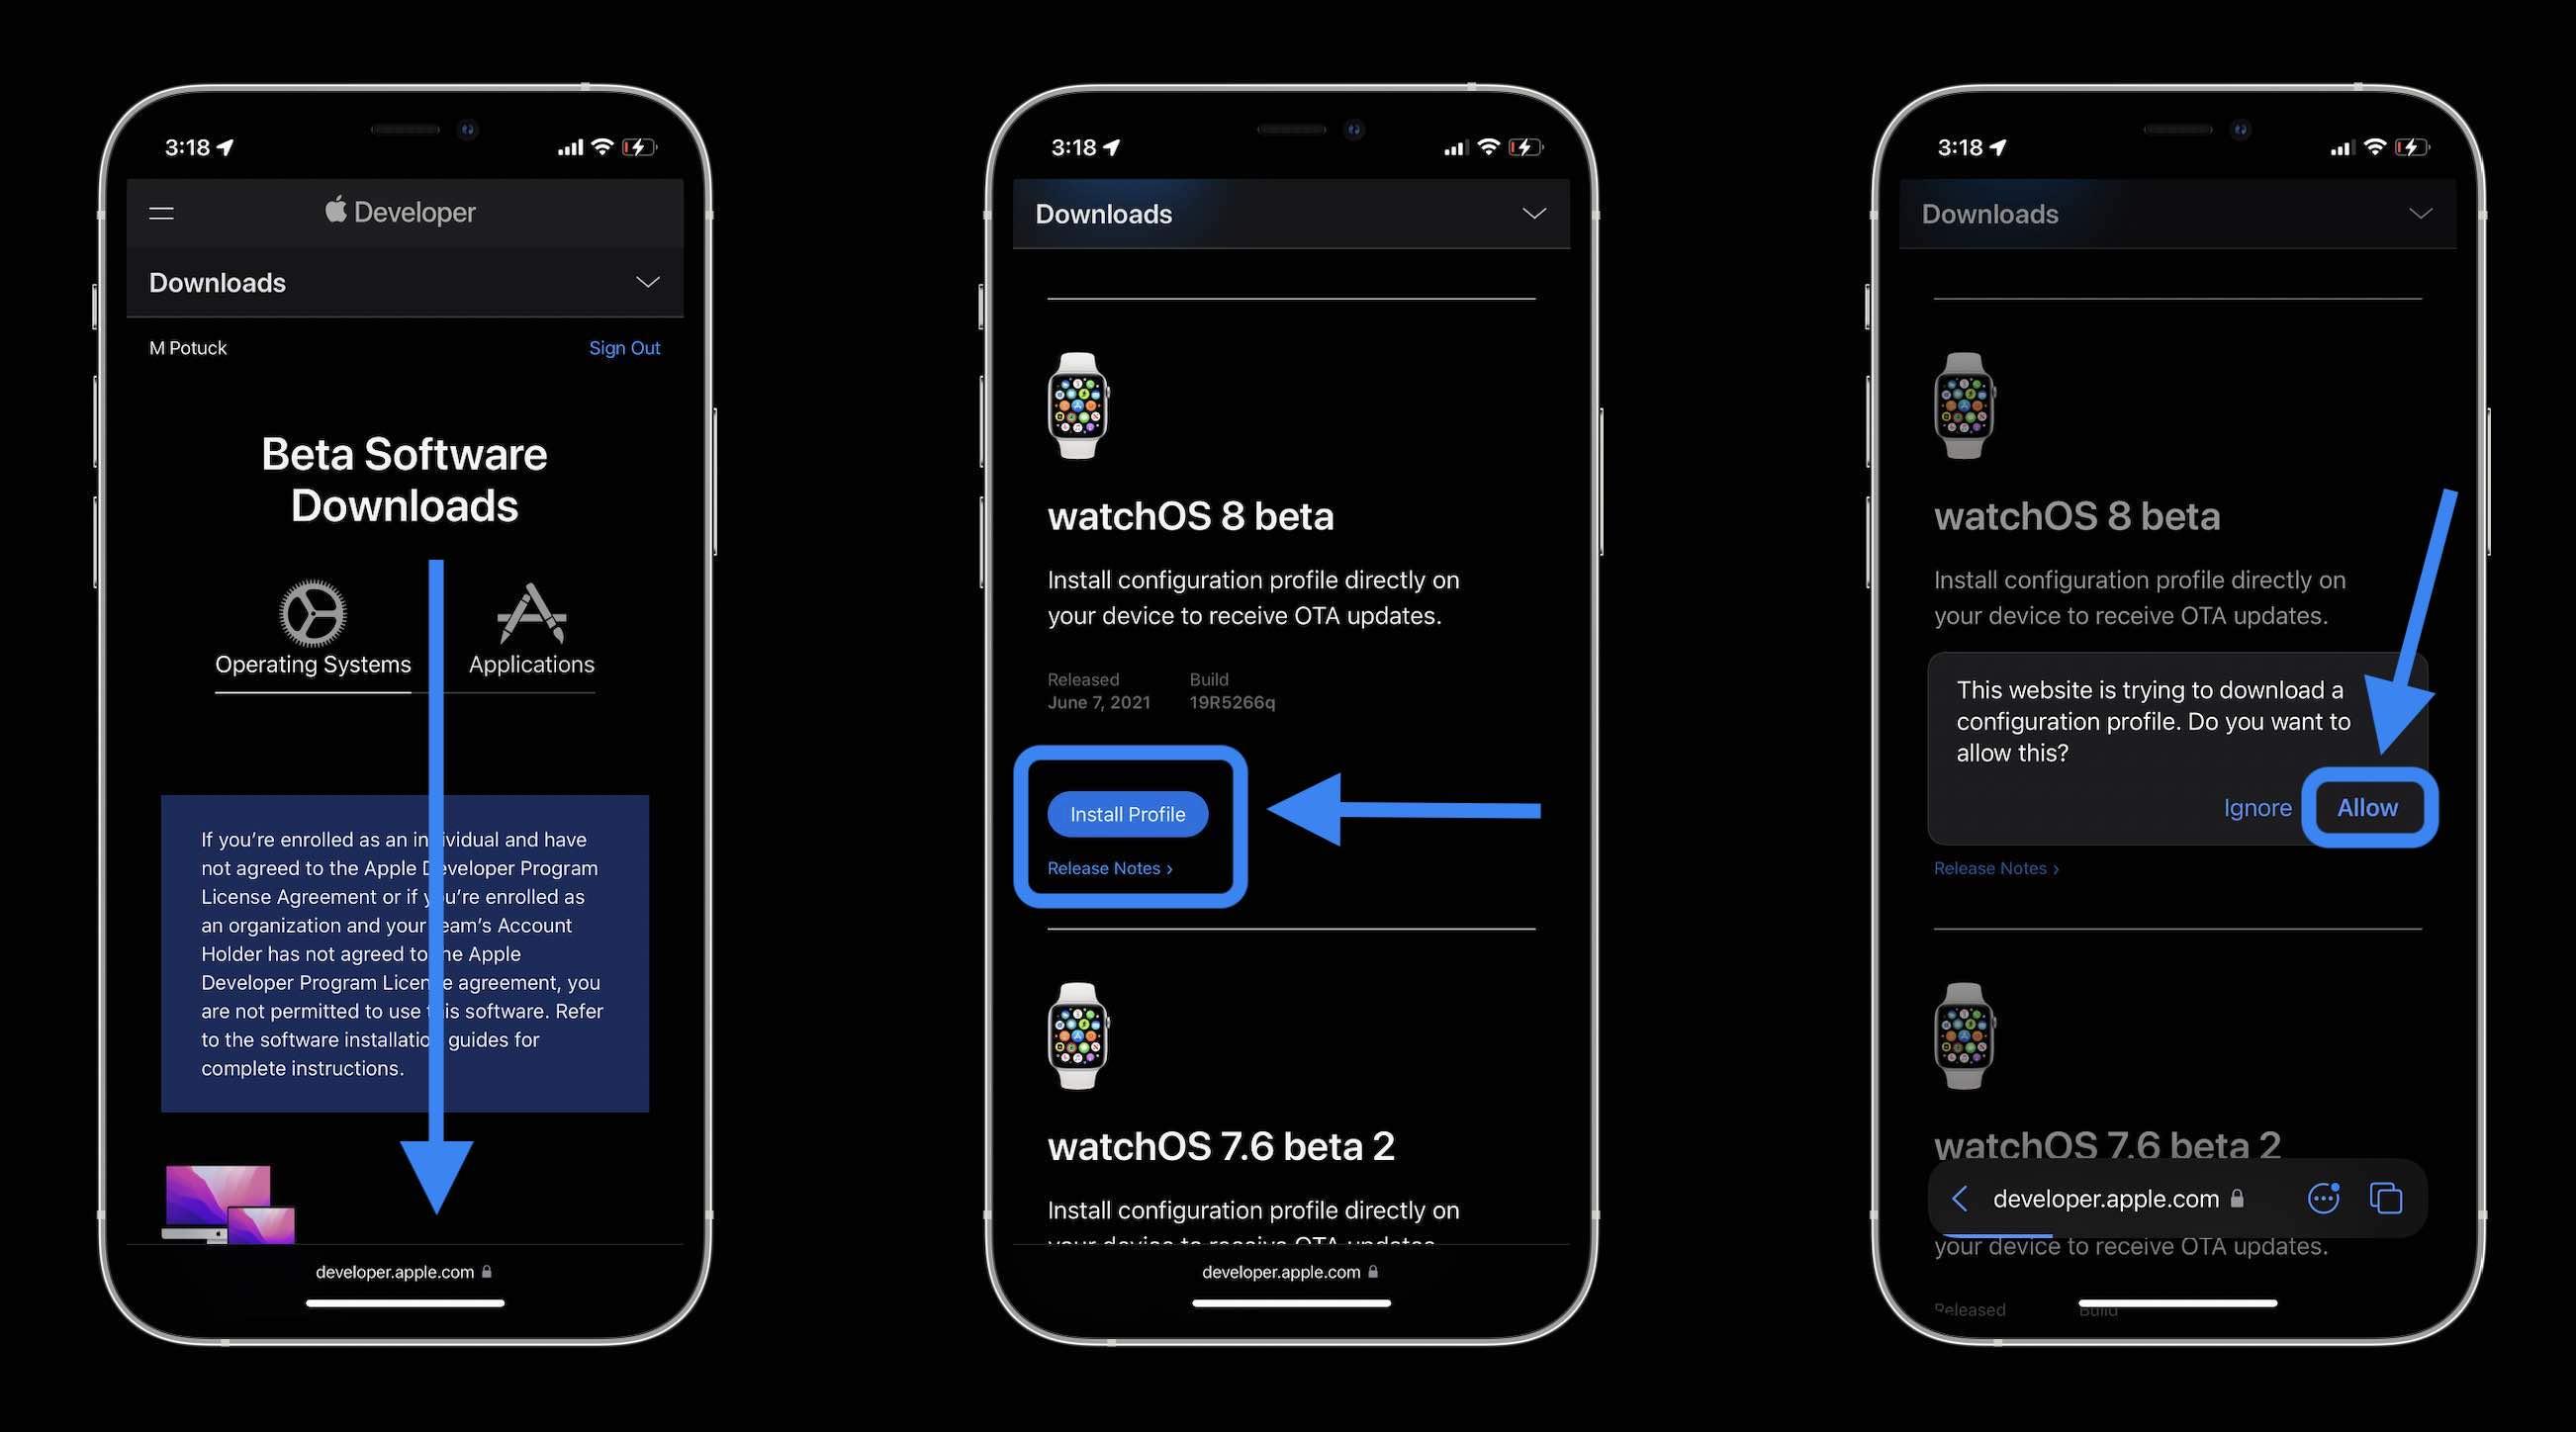 How to install watchOS 8 beta - walkthrough 2